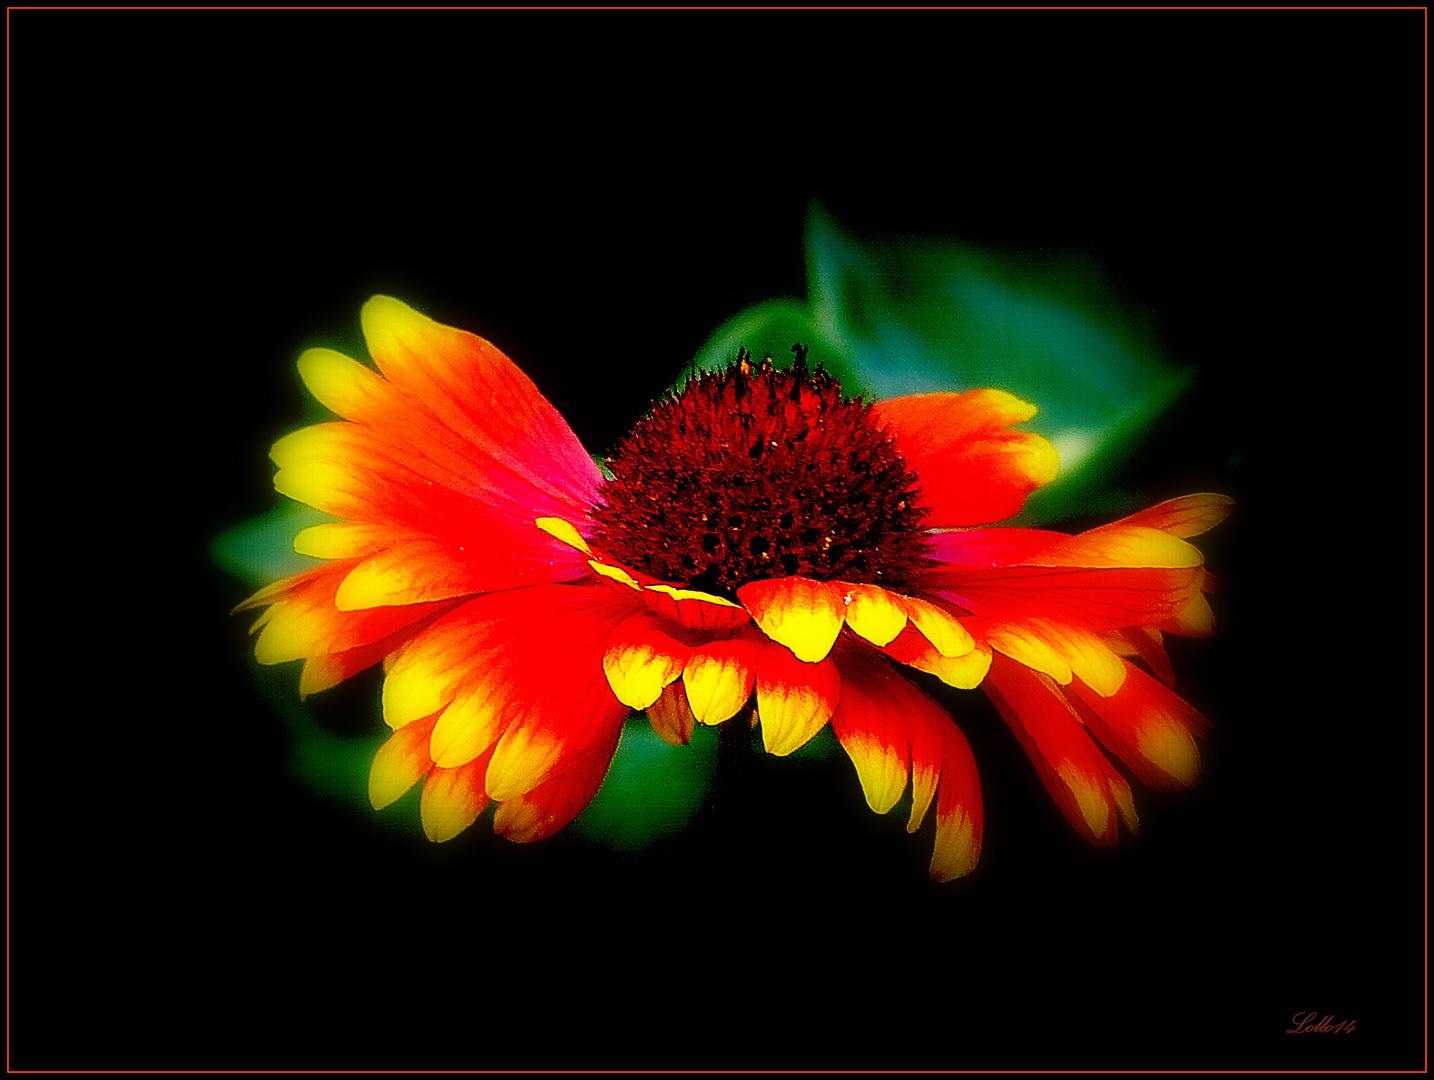 Feuerblume ...